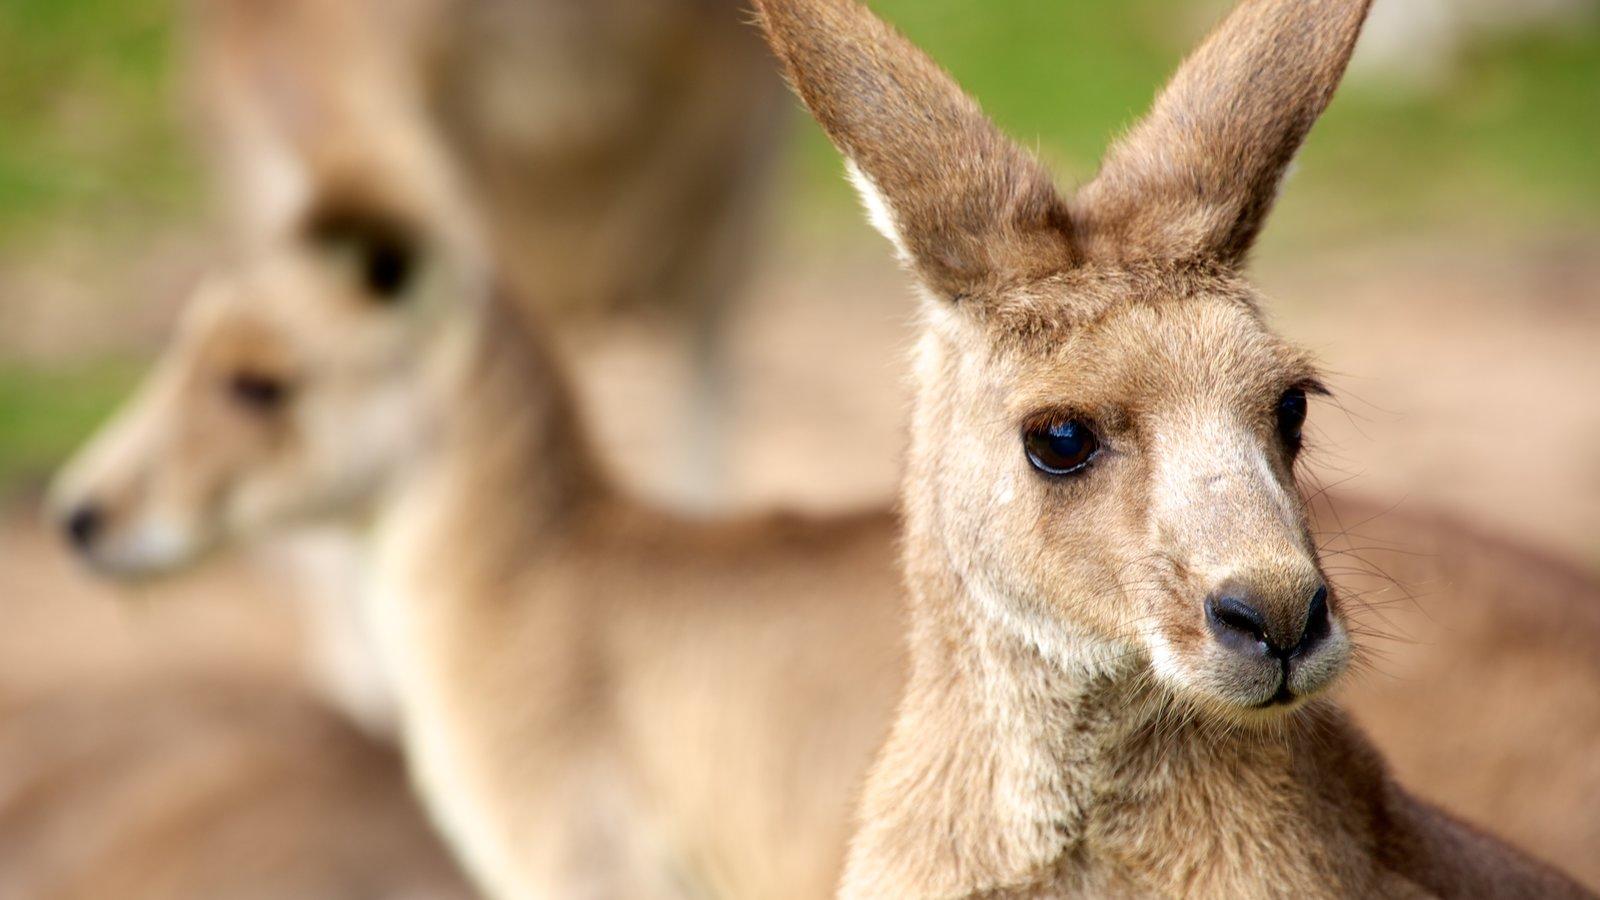 Lone Pine Koala Sanctuary featuring zoo animals